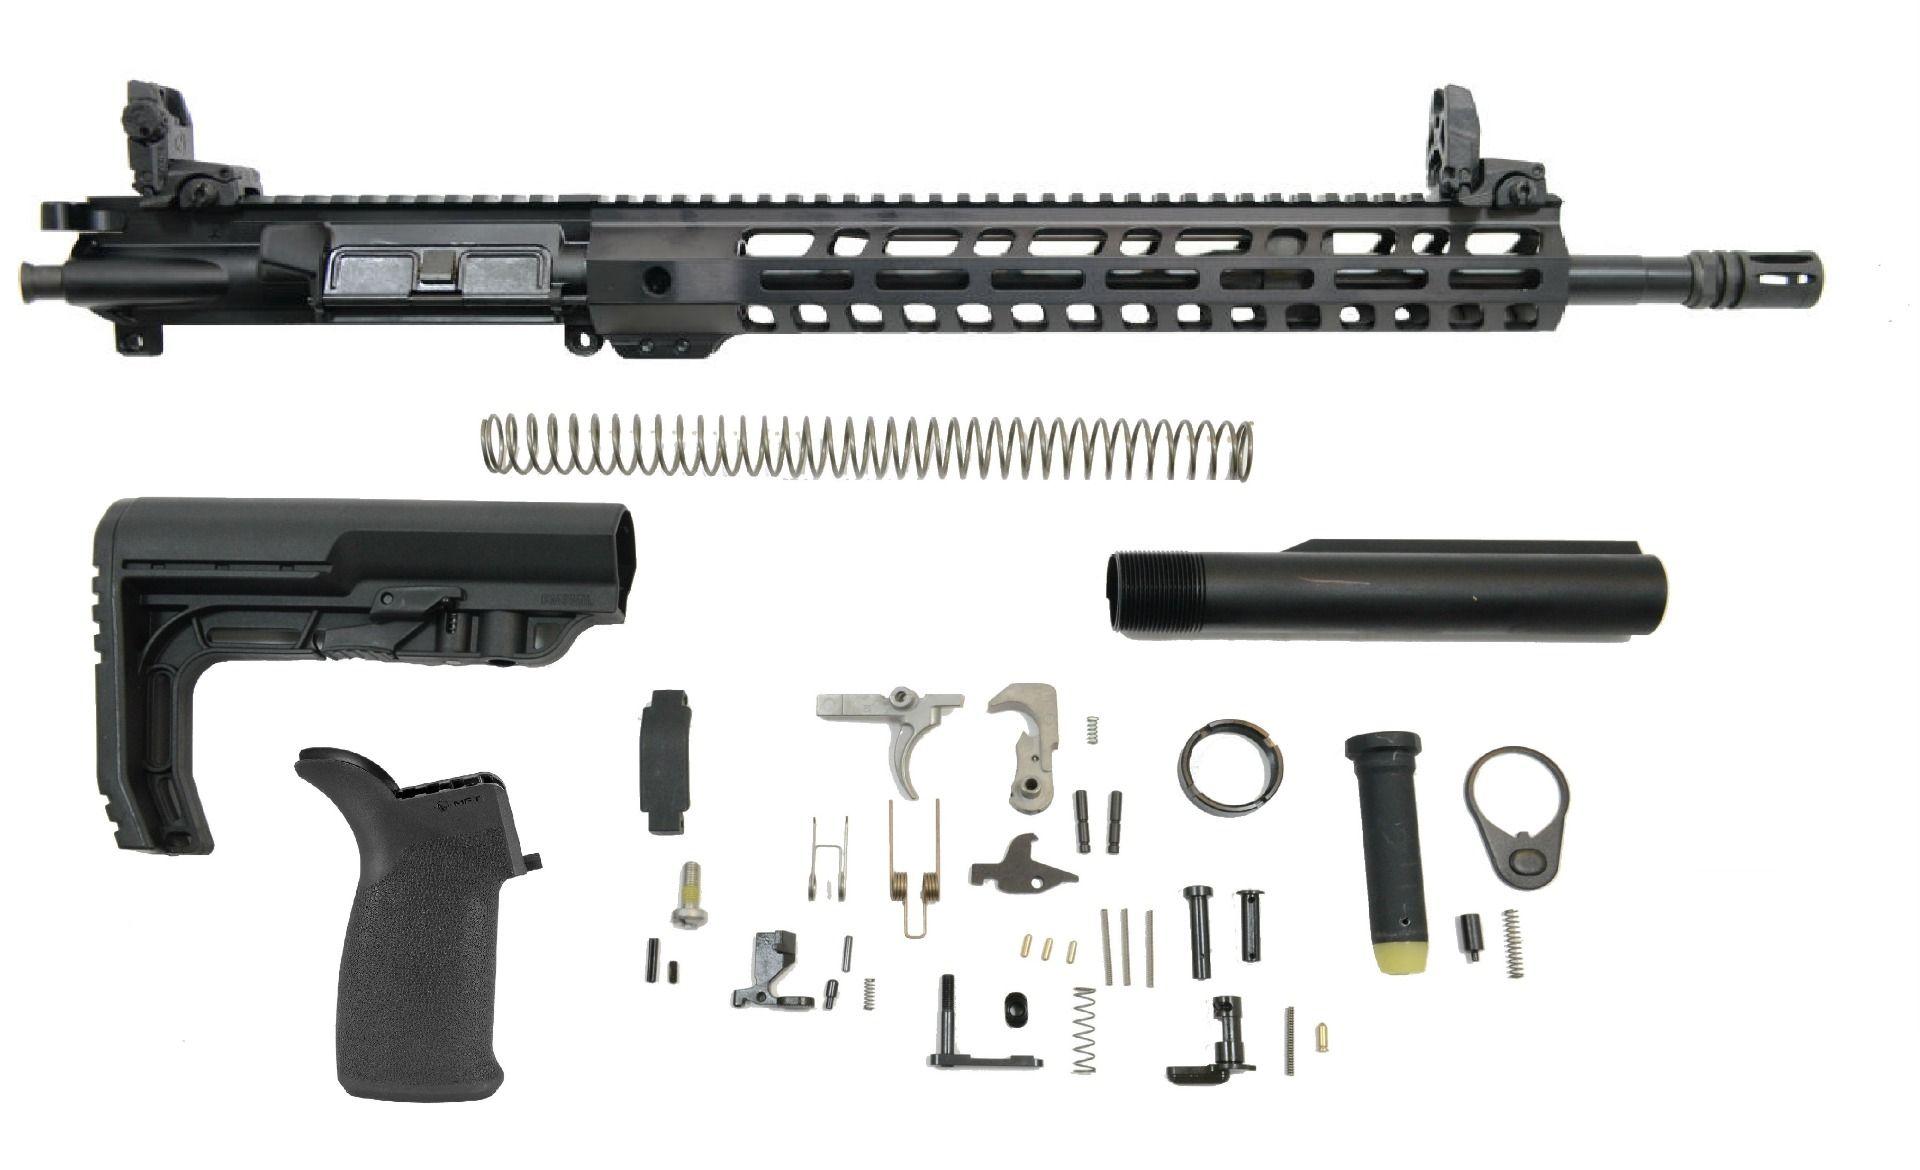 PSA 16″ CARBINE-LENGTH M4 5.56 NATO 1/7 NITRIDE 13.5″ LIGHTWEIGHT M-LOK MFT MINIMALIST EPT RIFLE KIT WITH MBUS SIGHT SET